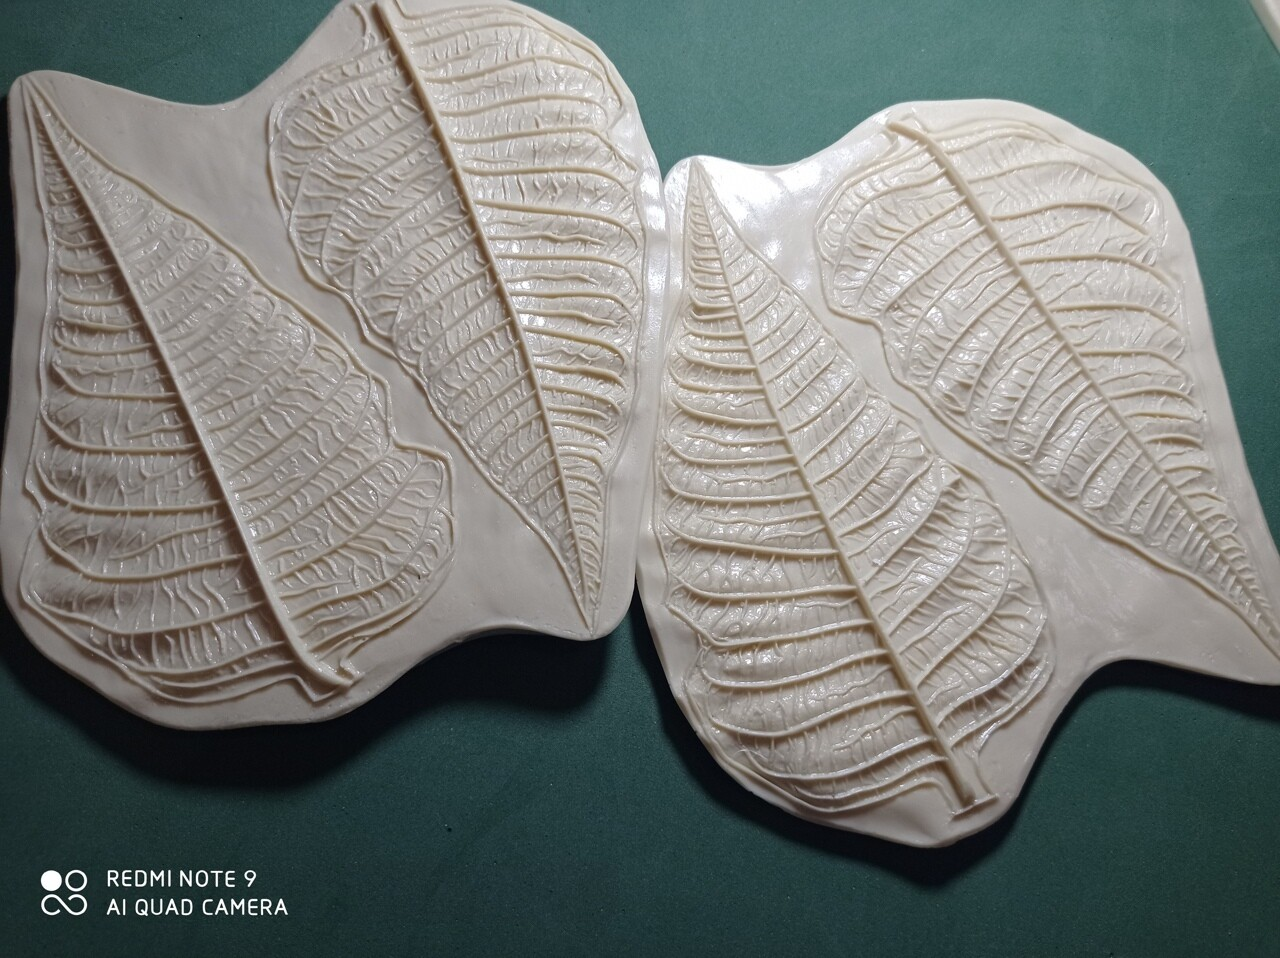 Молды КОМПЛЕКТ (2шт) Пуансетия Листья 15х8 и 15,5х8,5см и Лепестки 11х6,5 и 11х9см